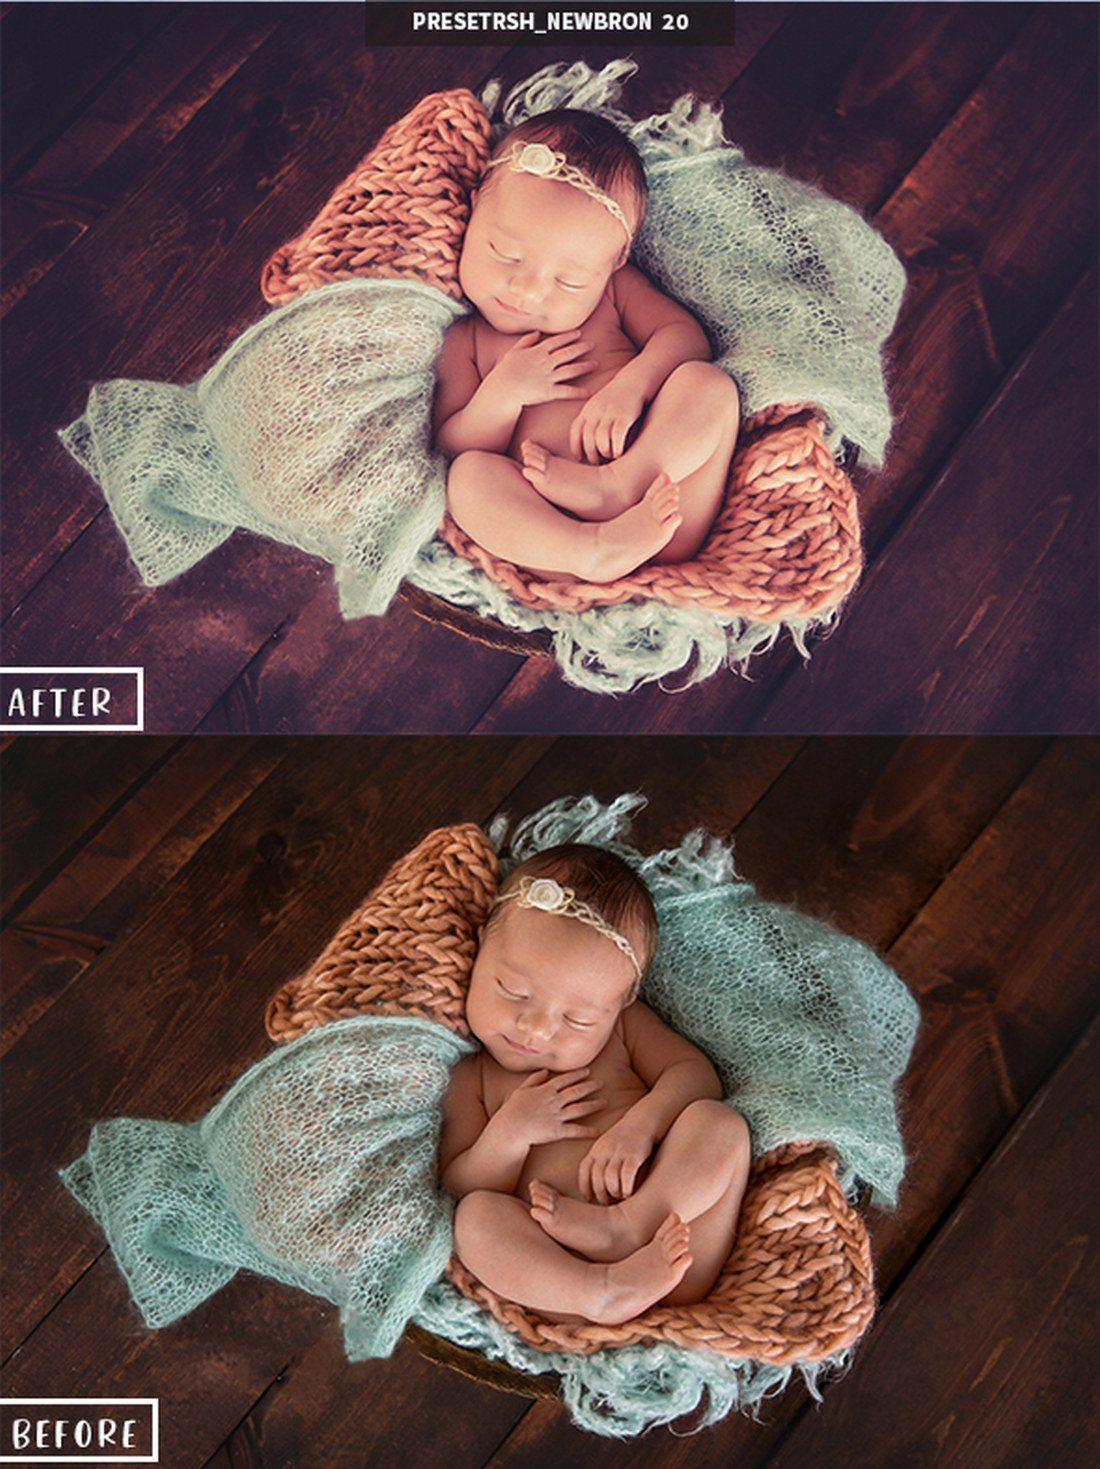 30-Newborn-Lightroom-Camera-Raw-Presets 20 Best Newborn Lightroom Presets for Baby Photography design tips